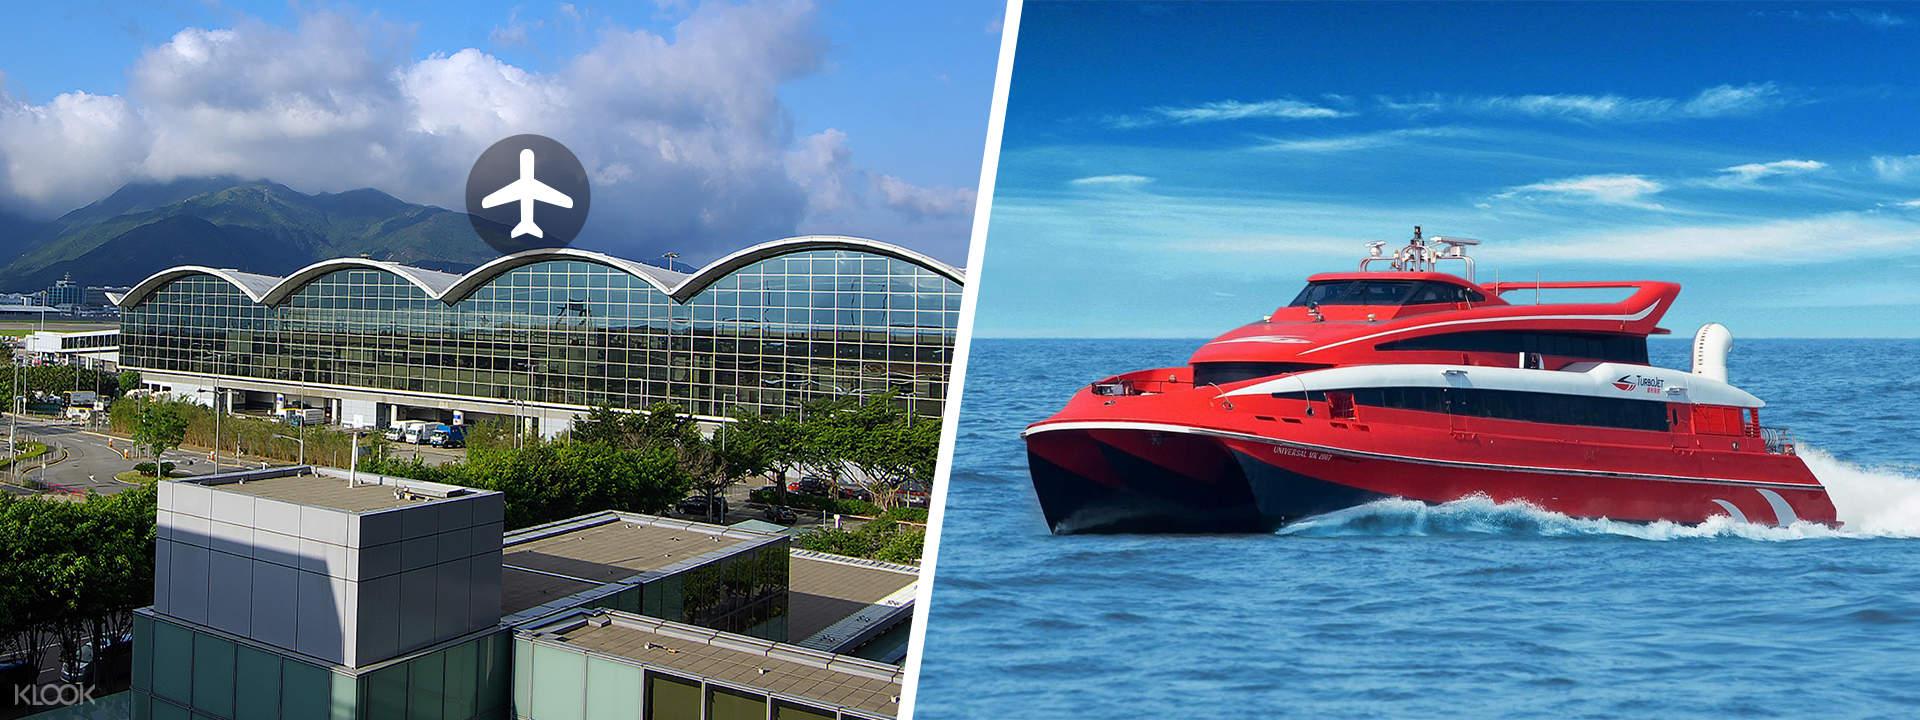 TurboJet Ferry Tickets (Macau - HK Airport) - Hong Kong